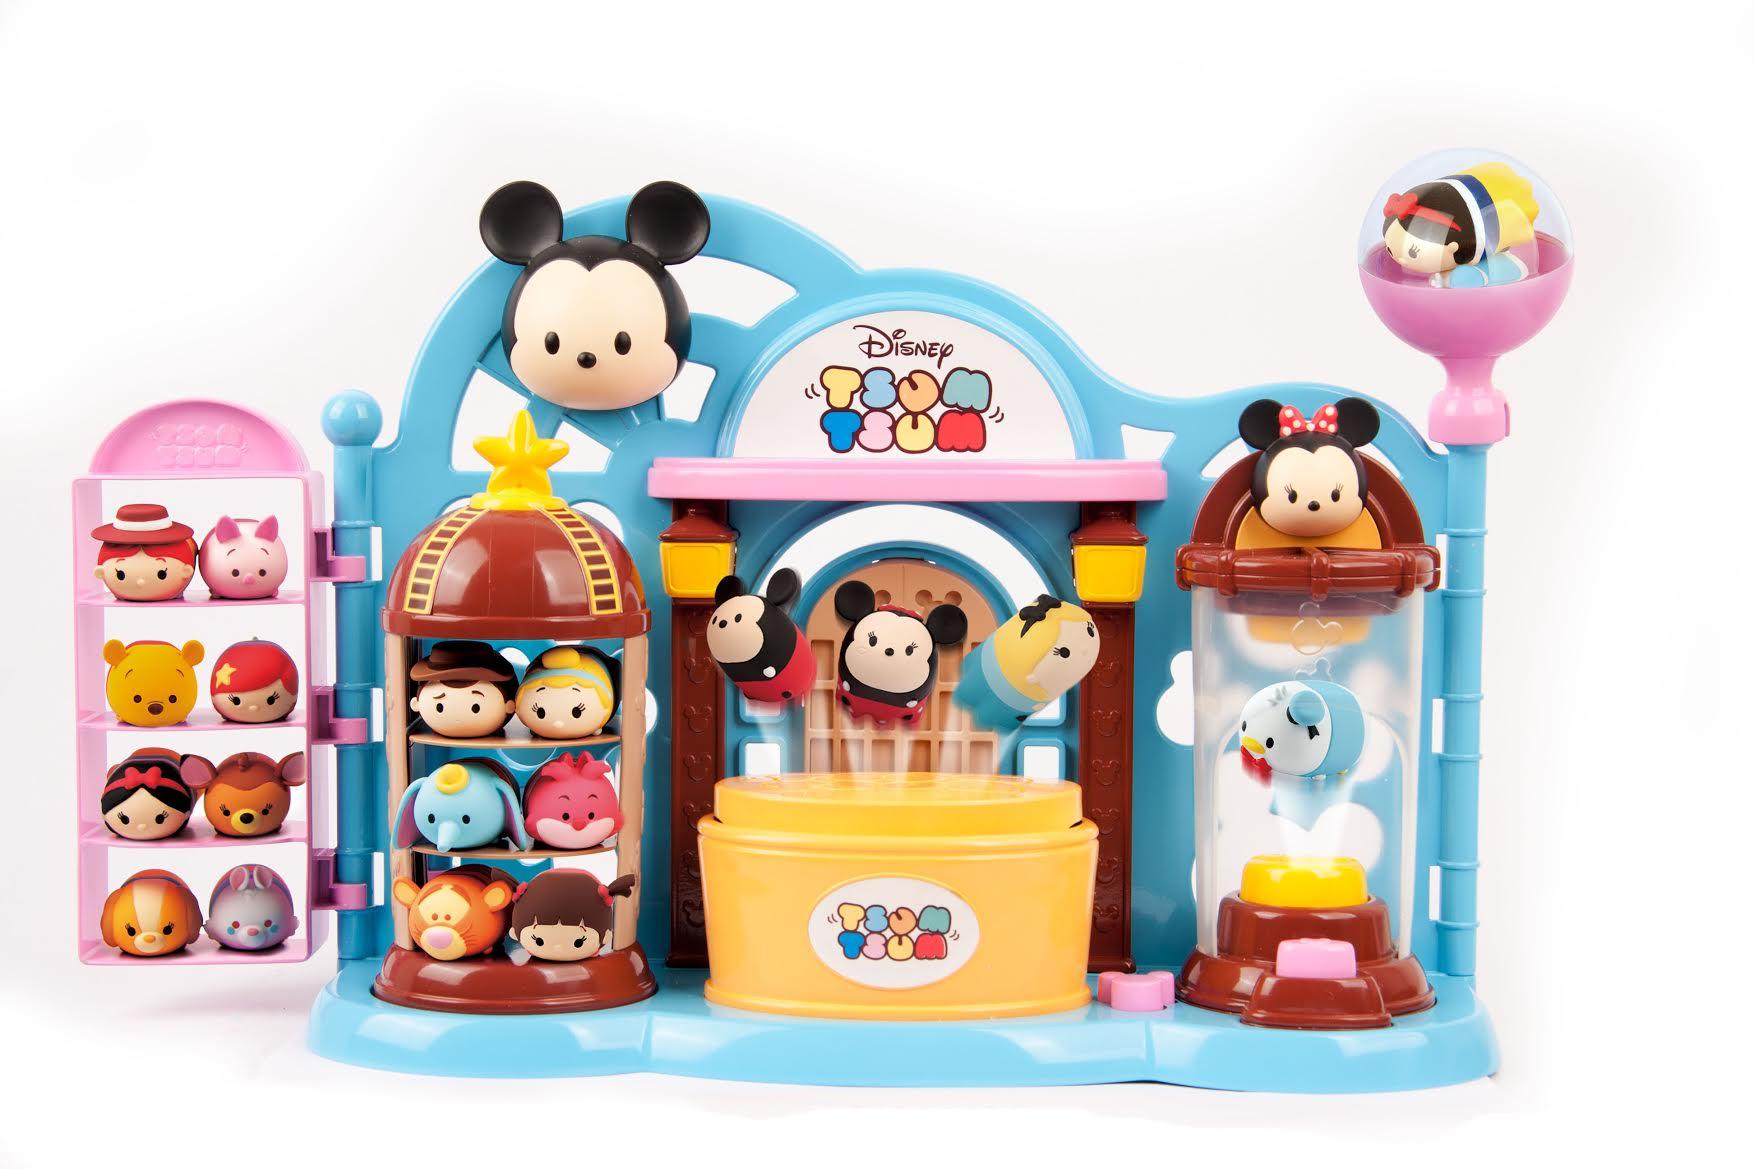 Squishy Toys Greece : Giveaway: Win a prize bundle of TSUM TSUM Squishies Disney toys KIDS  BLOG CLUB